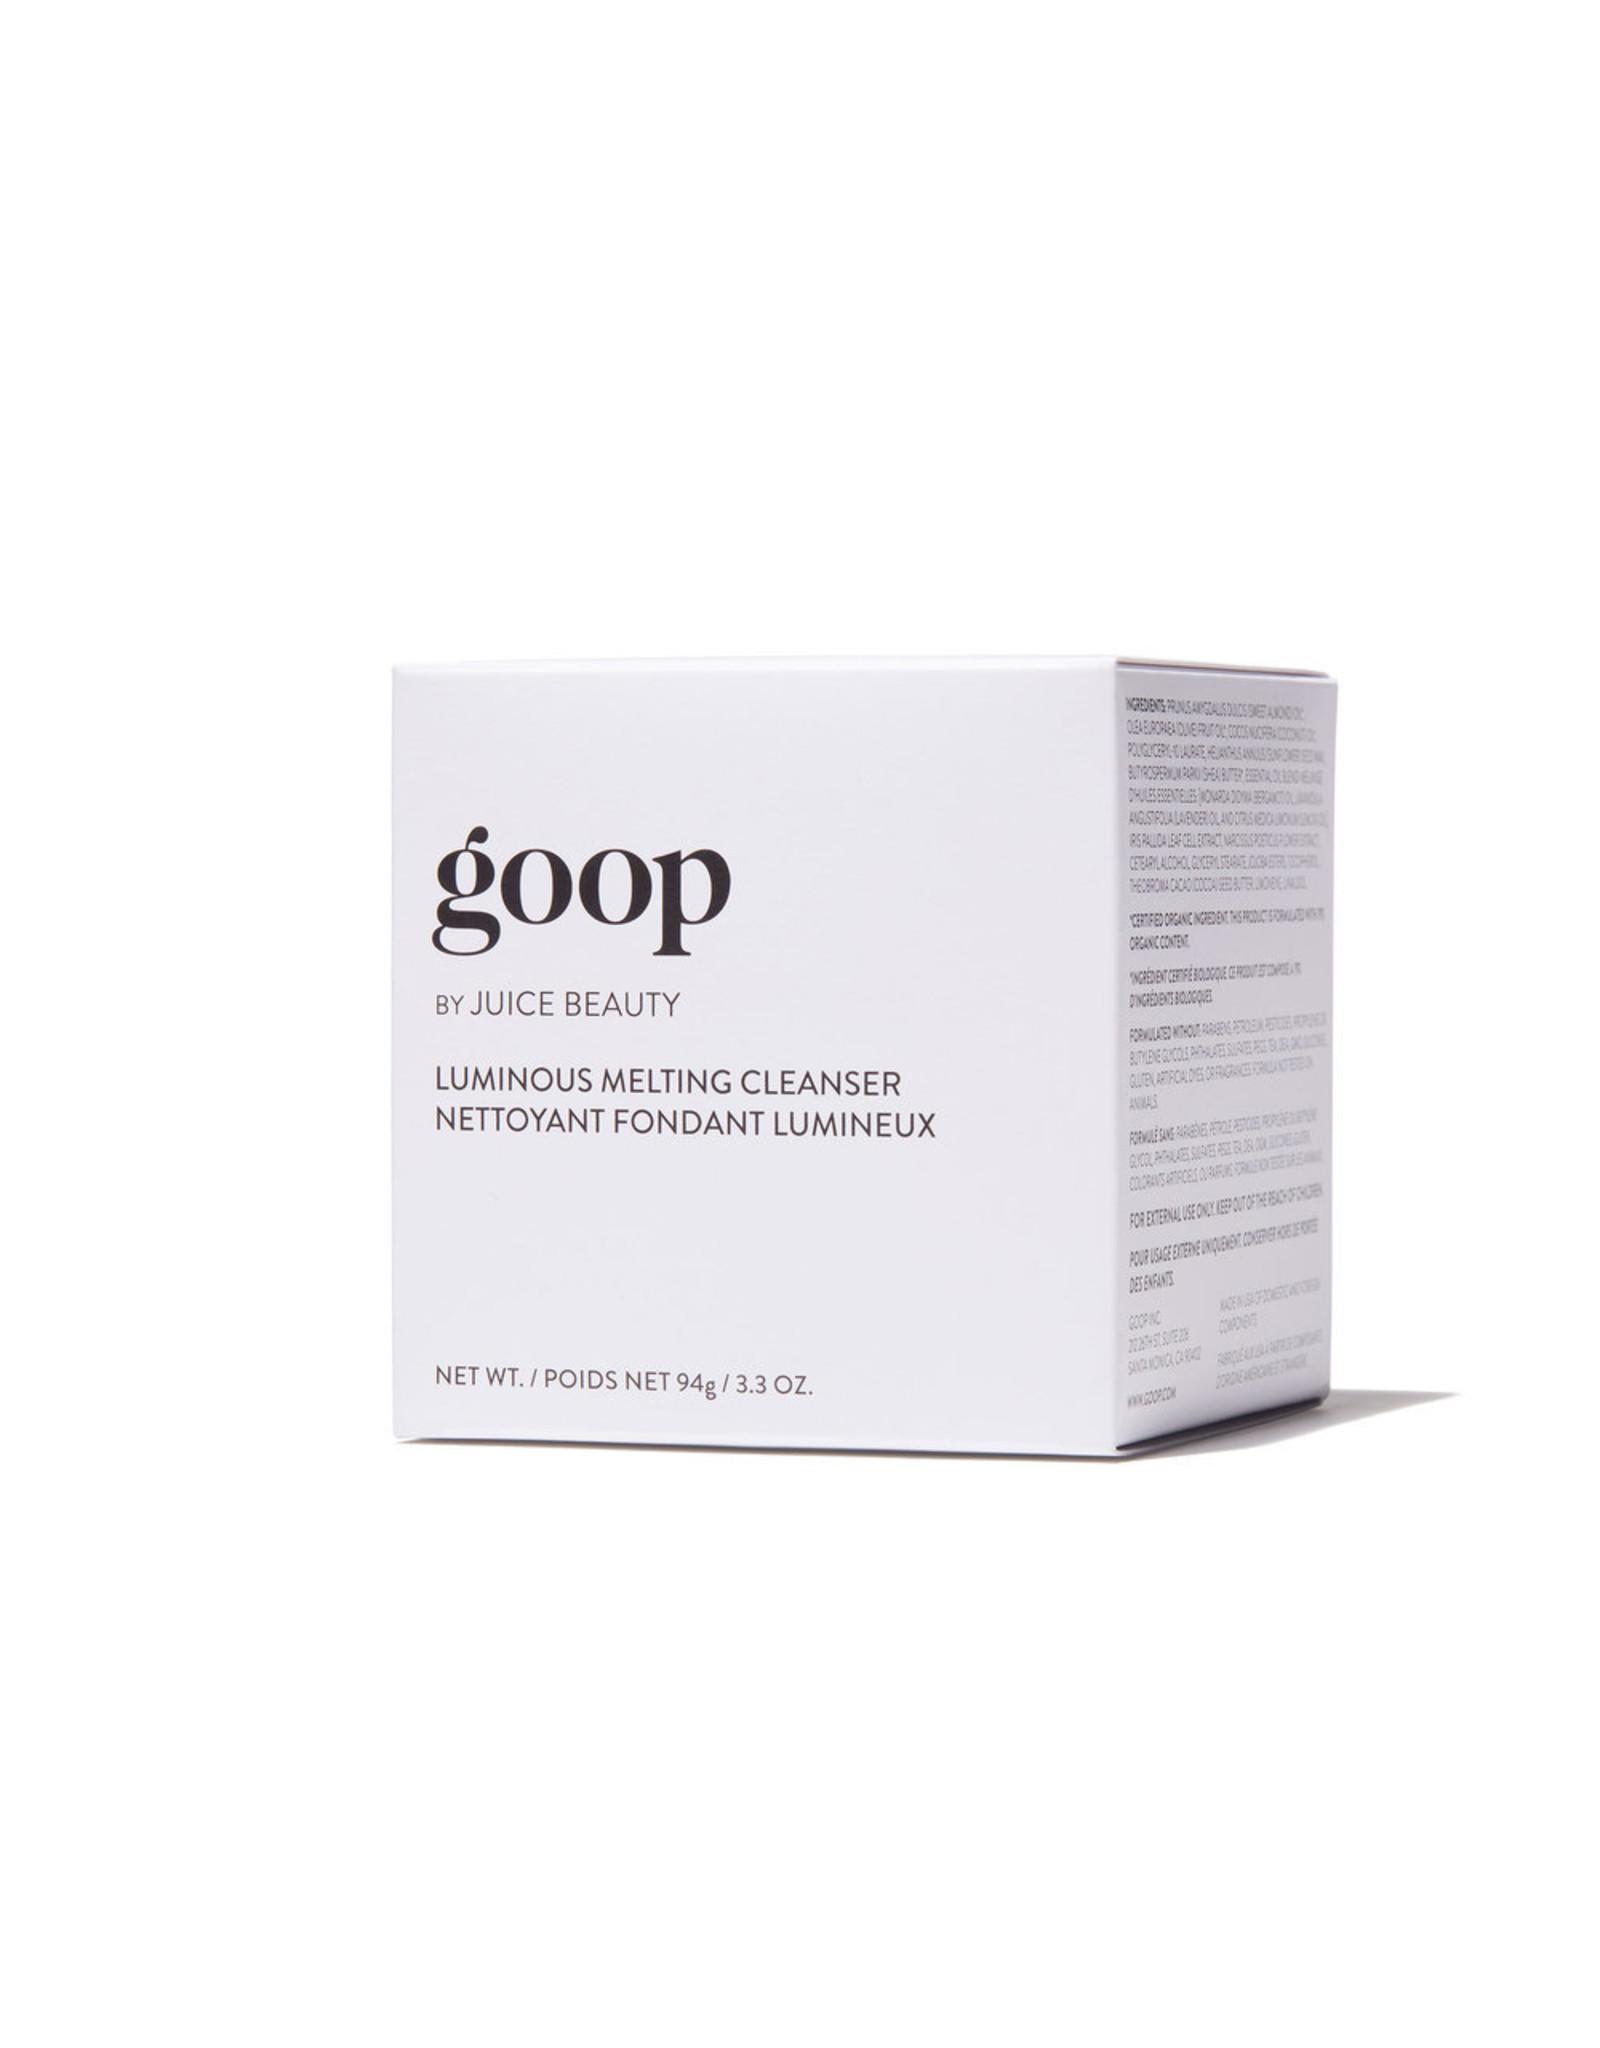 Goop by Juice Beauty goop Beauty Luminous Melting Cleanser